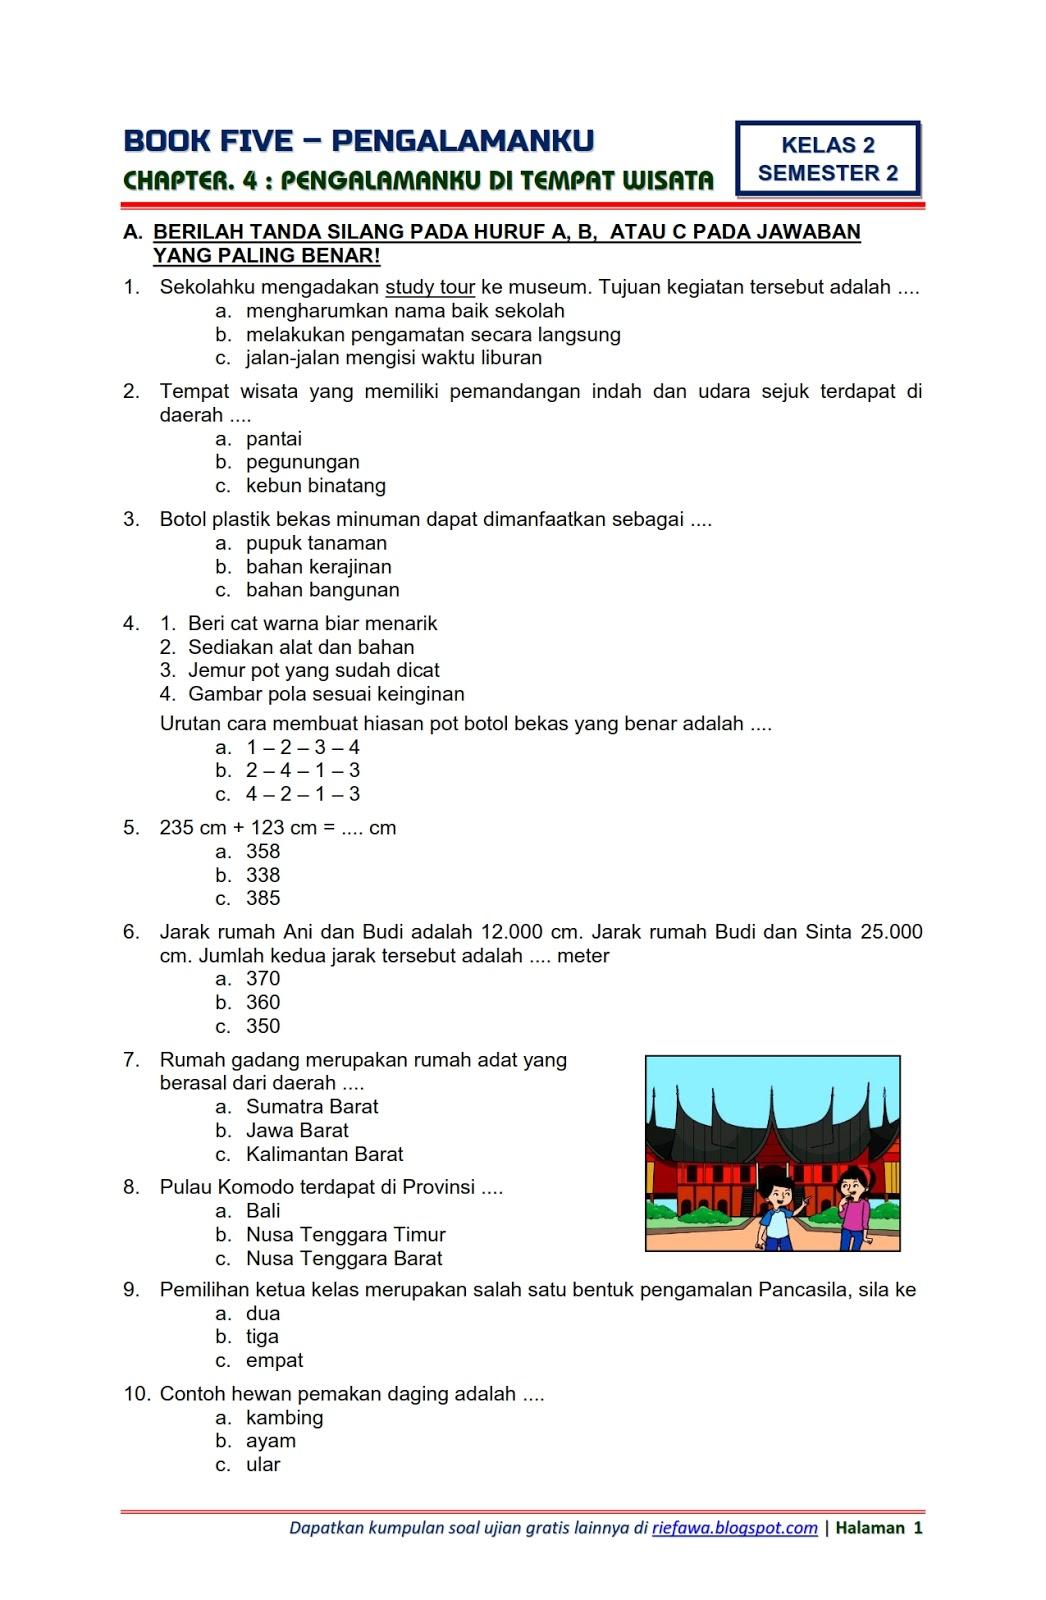 Download Soal Tematik Kelas 2 Semester 2 Tema 5 Subtema 4 Pengalamanku Pengalamanku Di